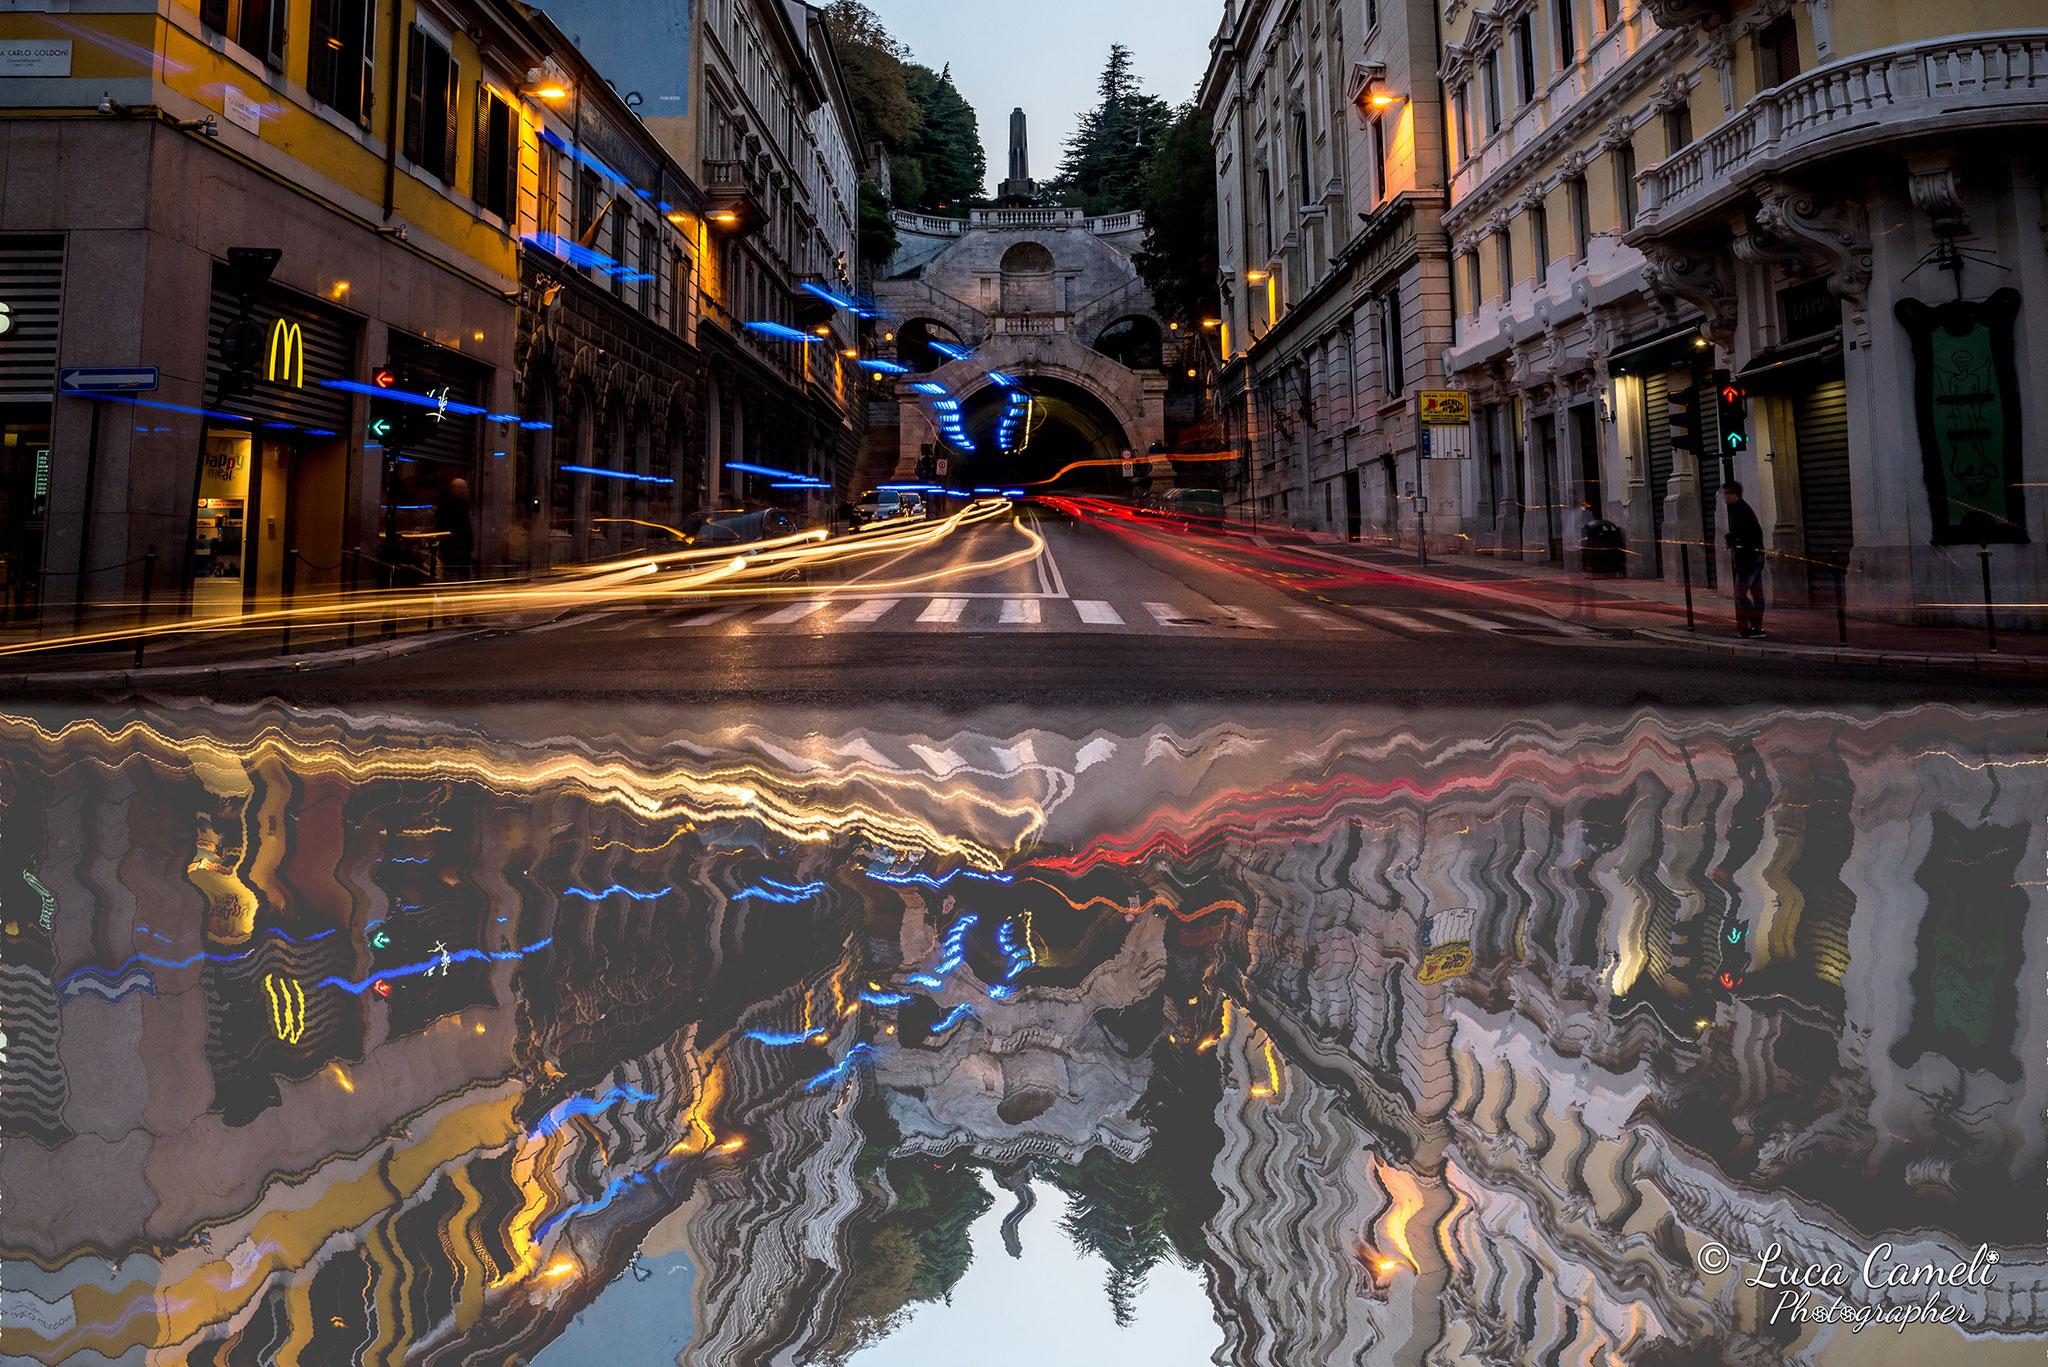 Riflessi Della Frenesia Quotidina, Piazza Carlo Goldoni - Trieste. LUCA CAMELI MEMBER WPE AWARDS INTERNATIONAL PHOTOGRAPHY